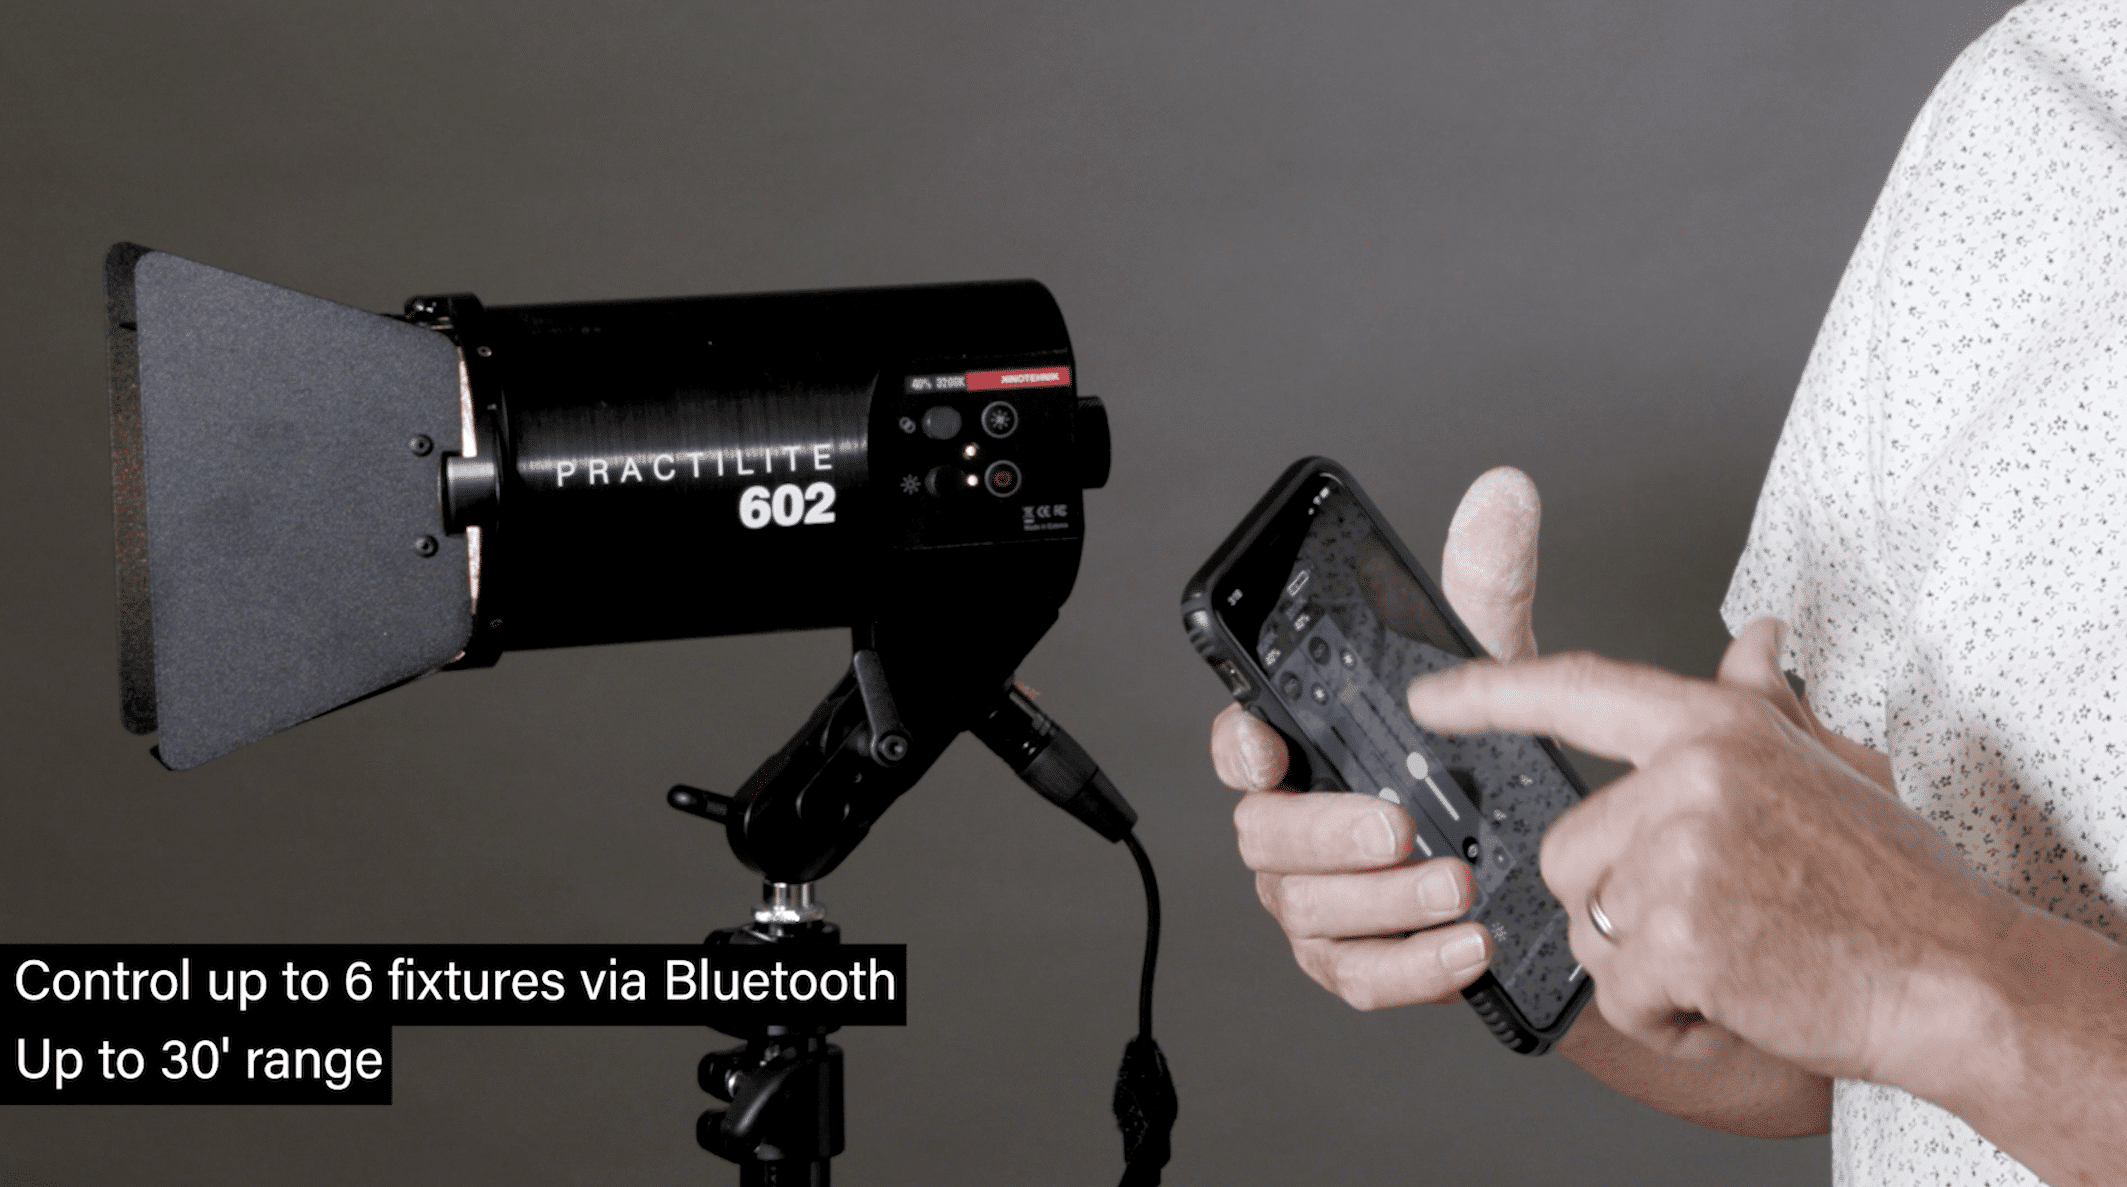 slanted lens practilite lighting study kinotehnik led lighting video photo